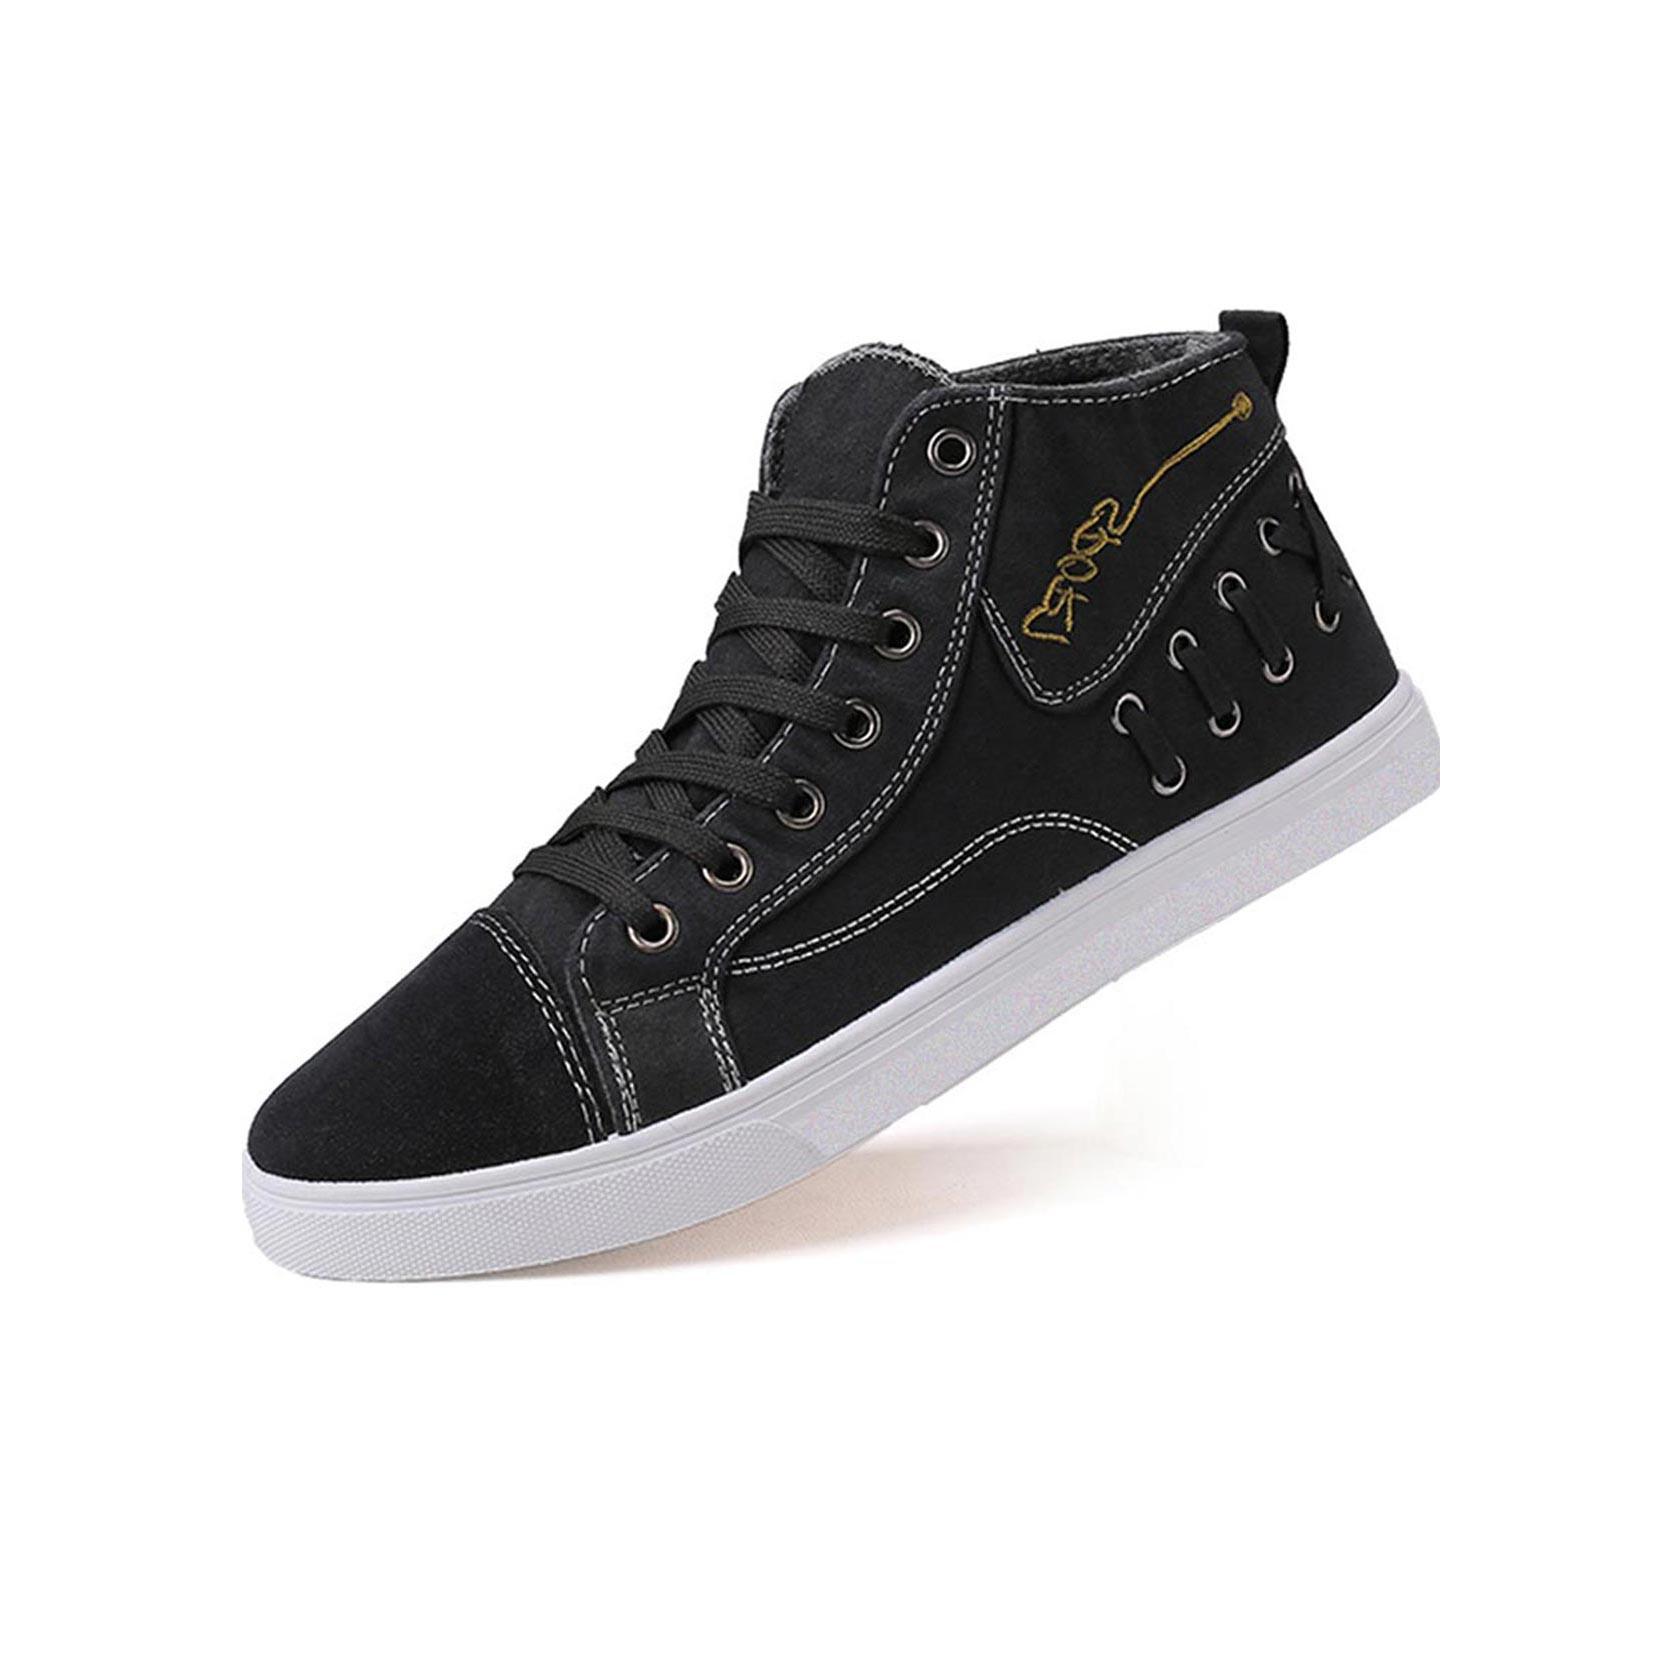 Giày thể thao nam cổ cao thời trang PETTINO - KS02